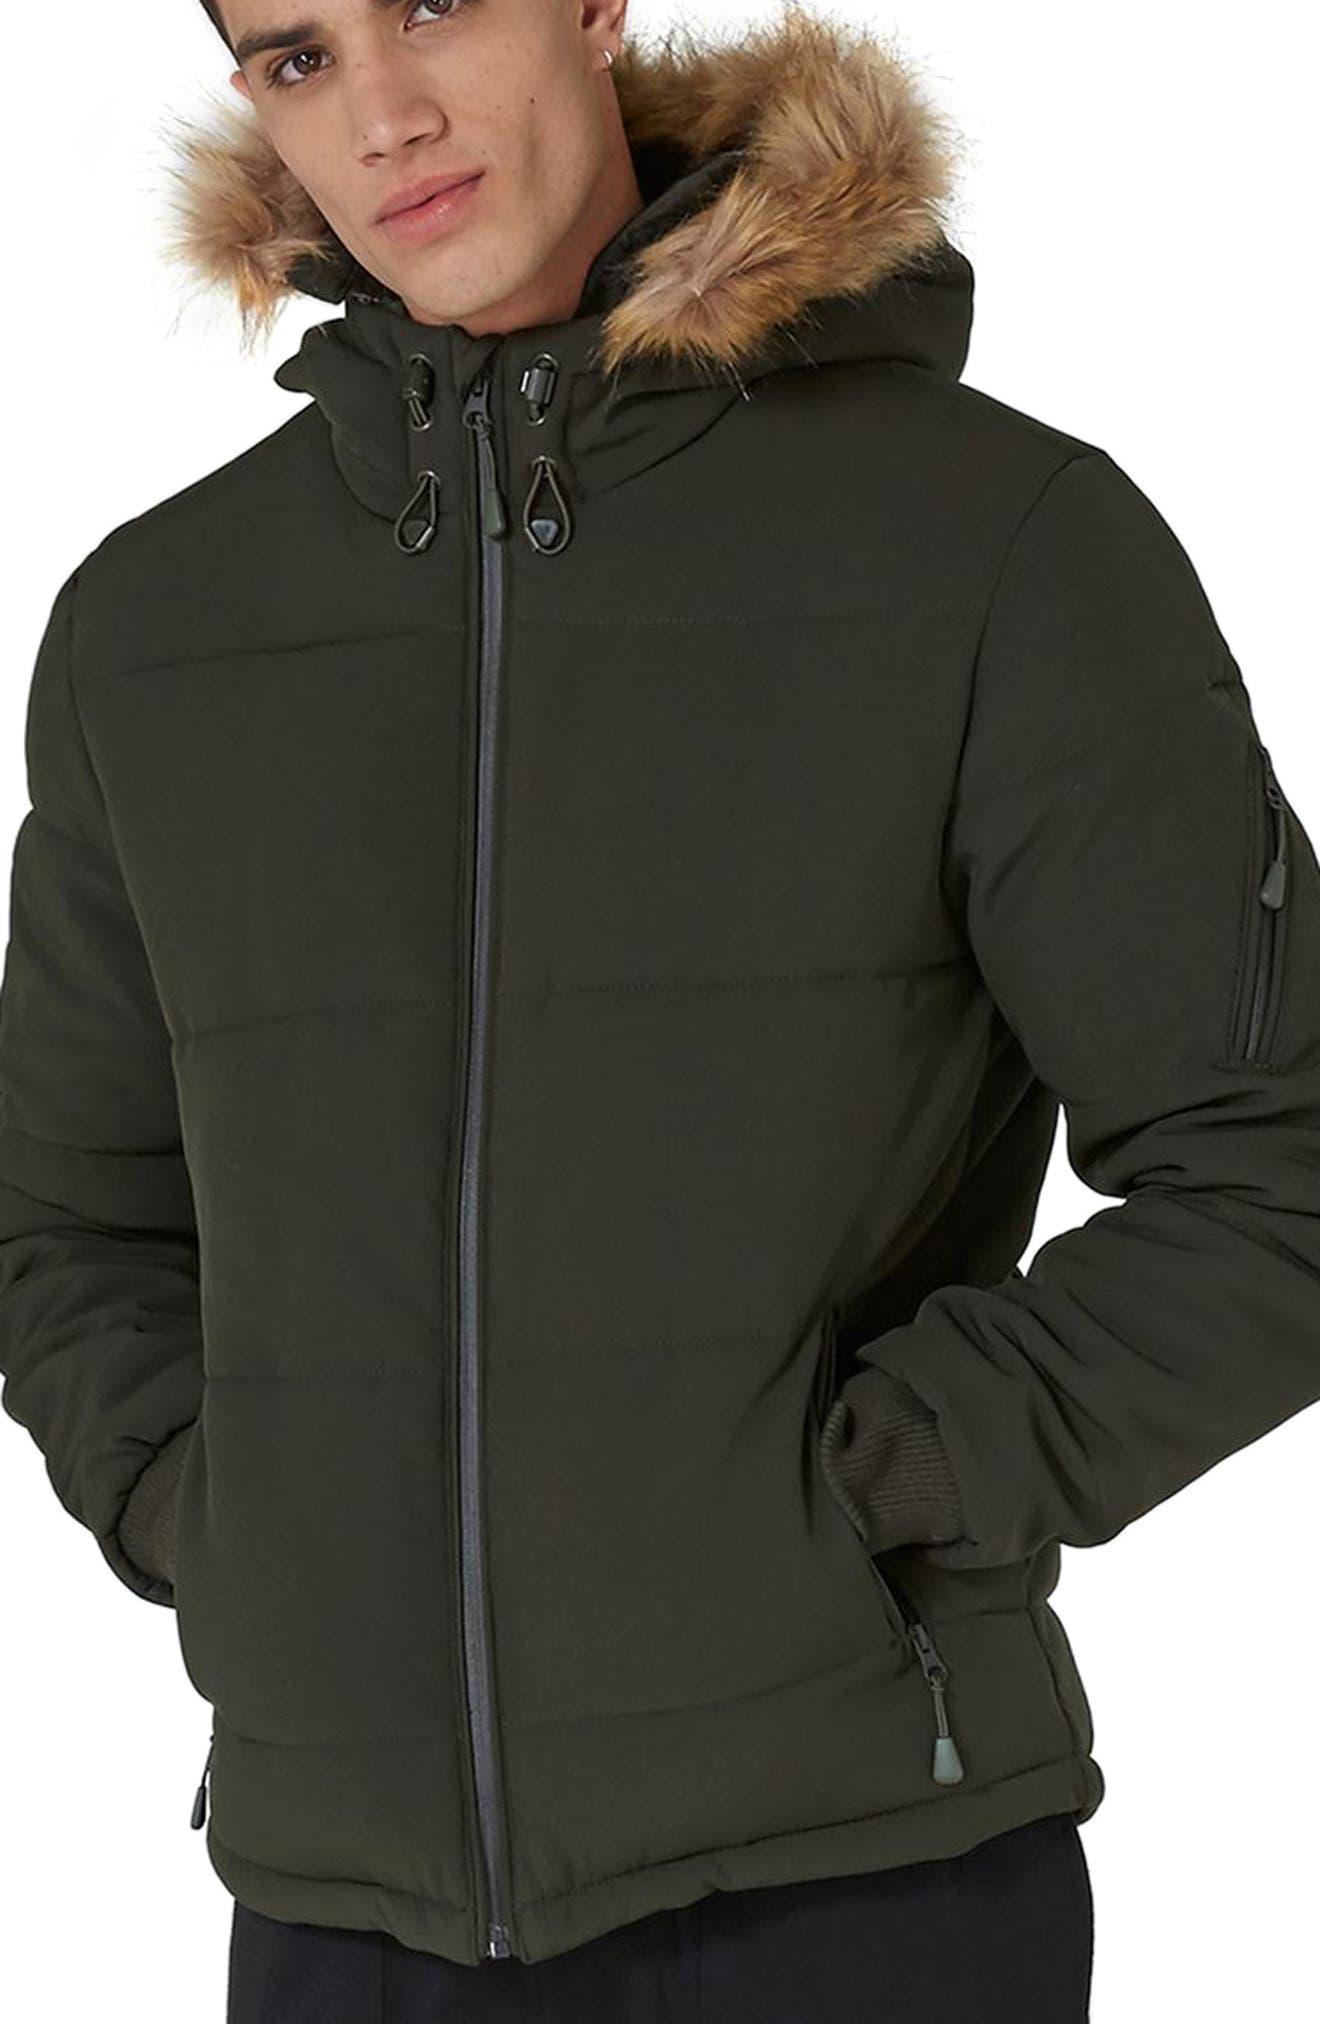 Maguire Faux Fur Trim Puffer Jacket,                             Main thumbnail 1, color,                             Green